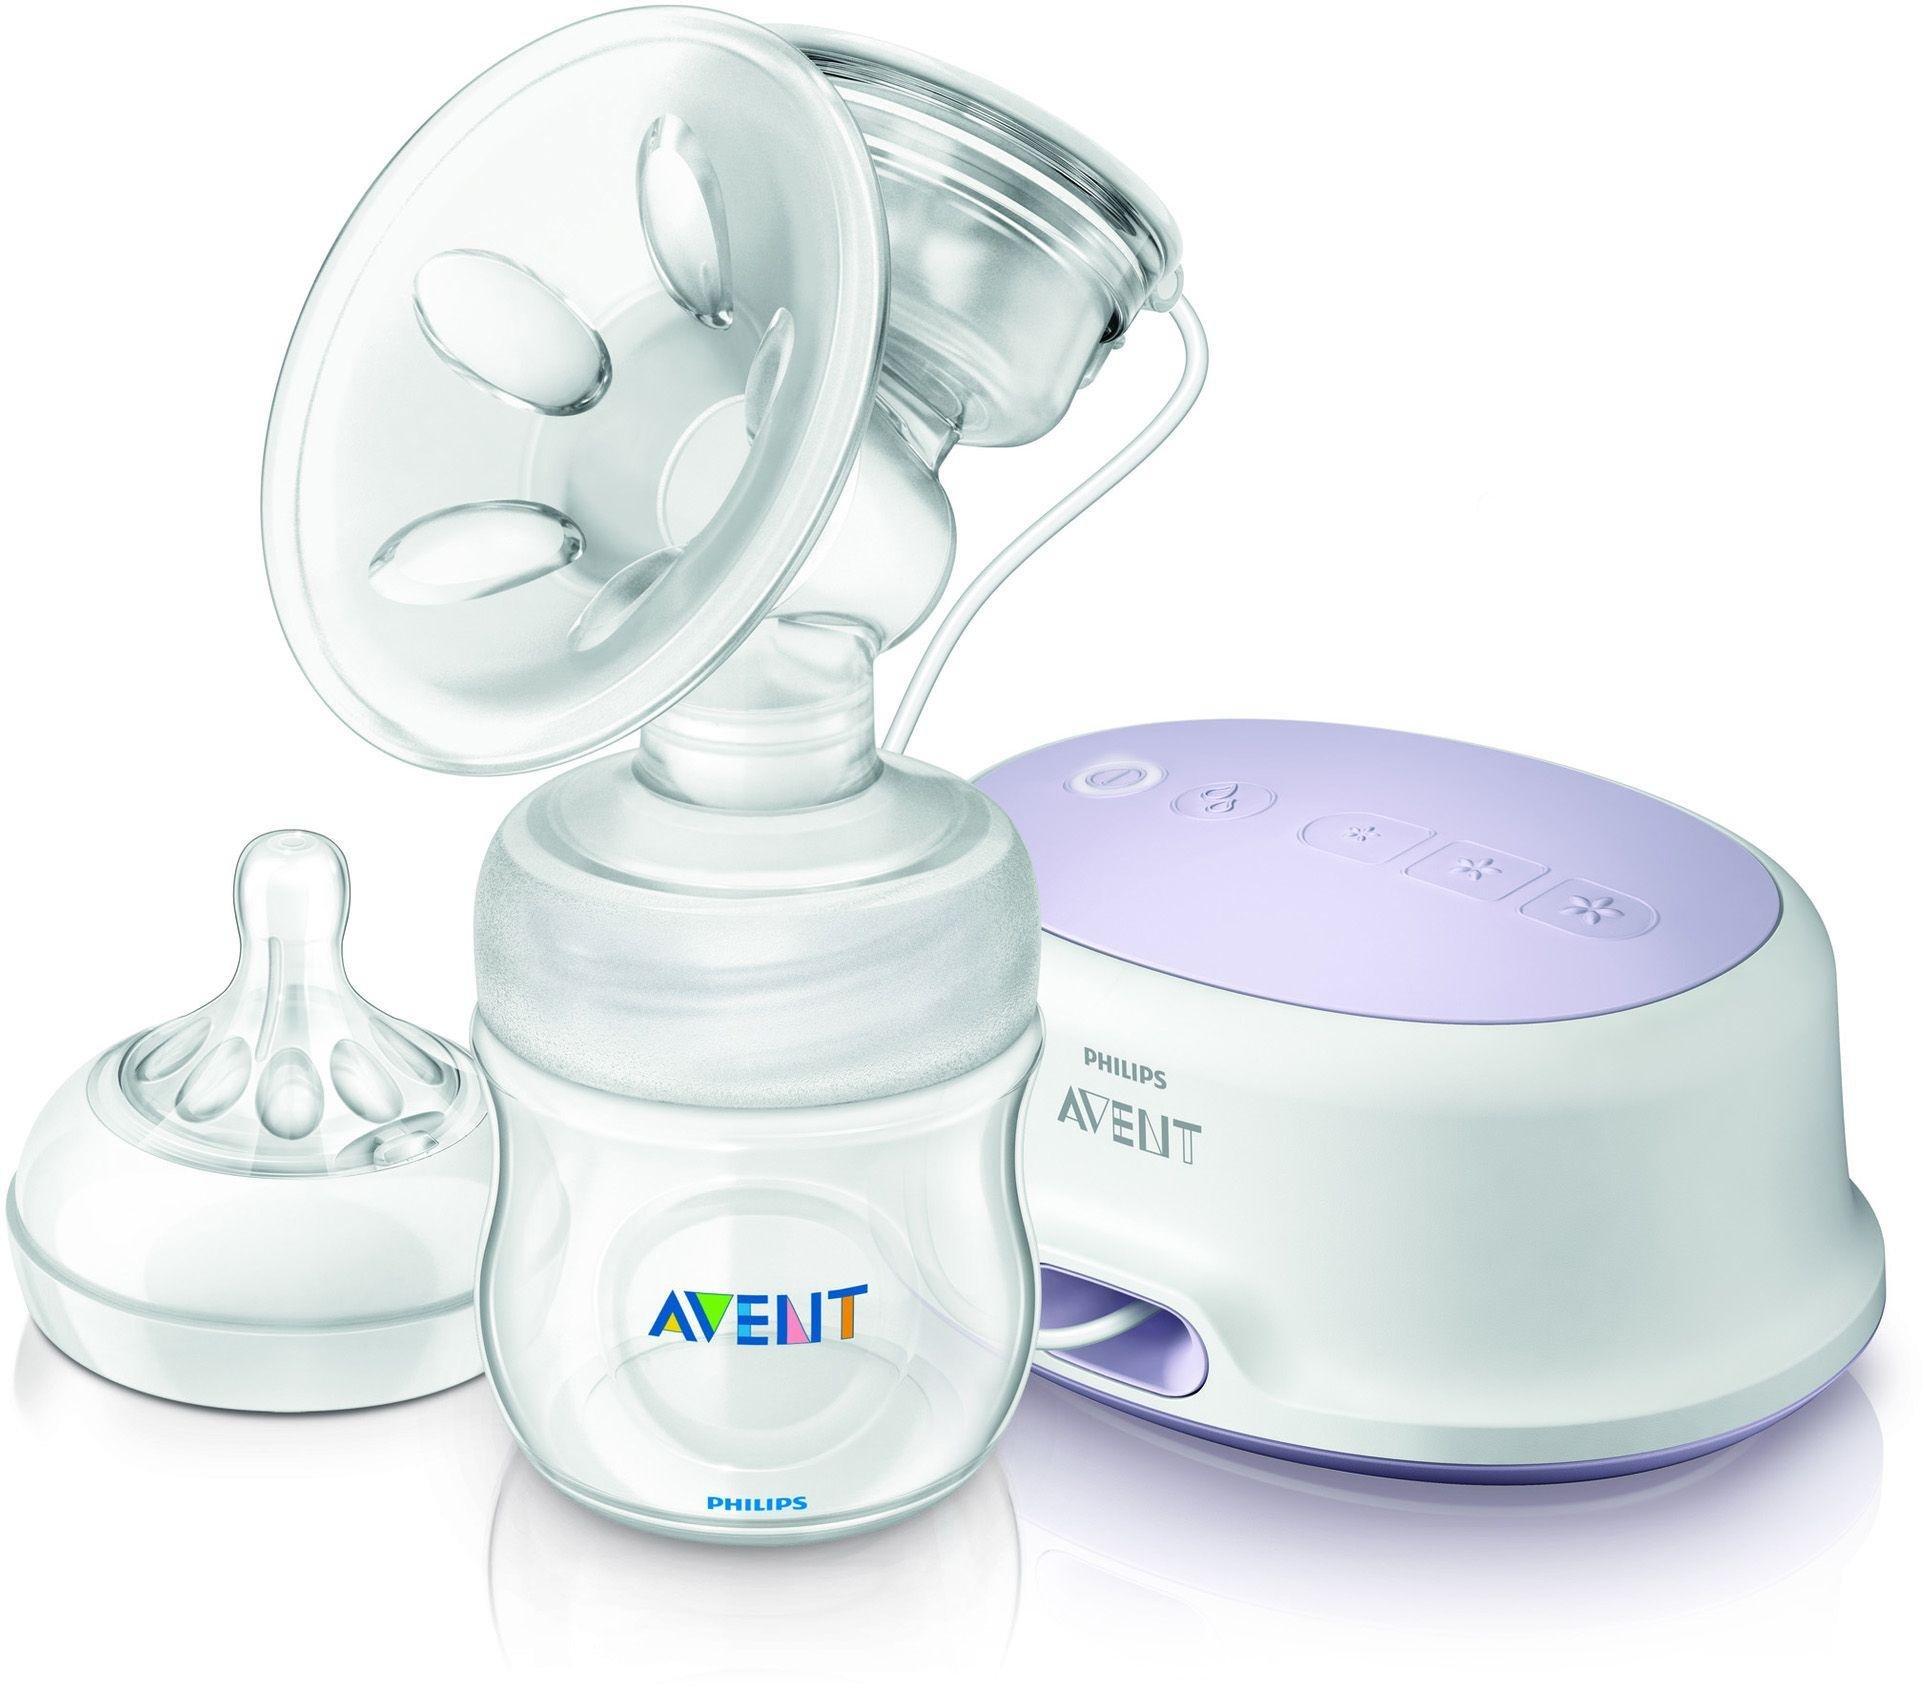 Philips Avent Comfort Electric Breast Pump SCF332/01